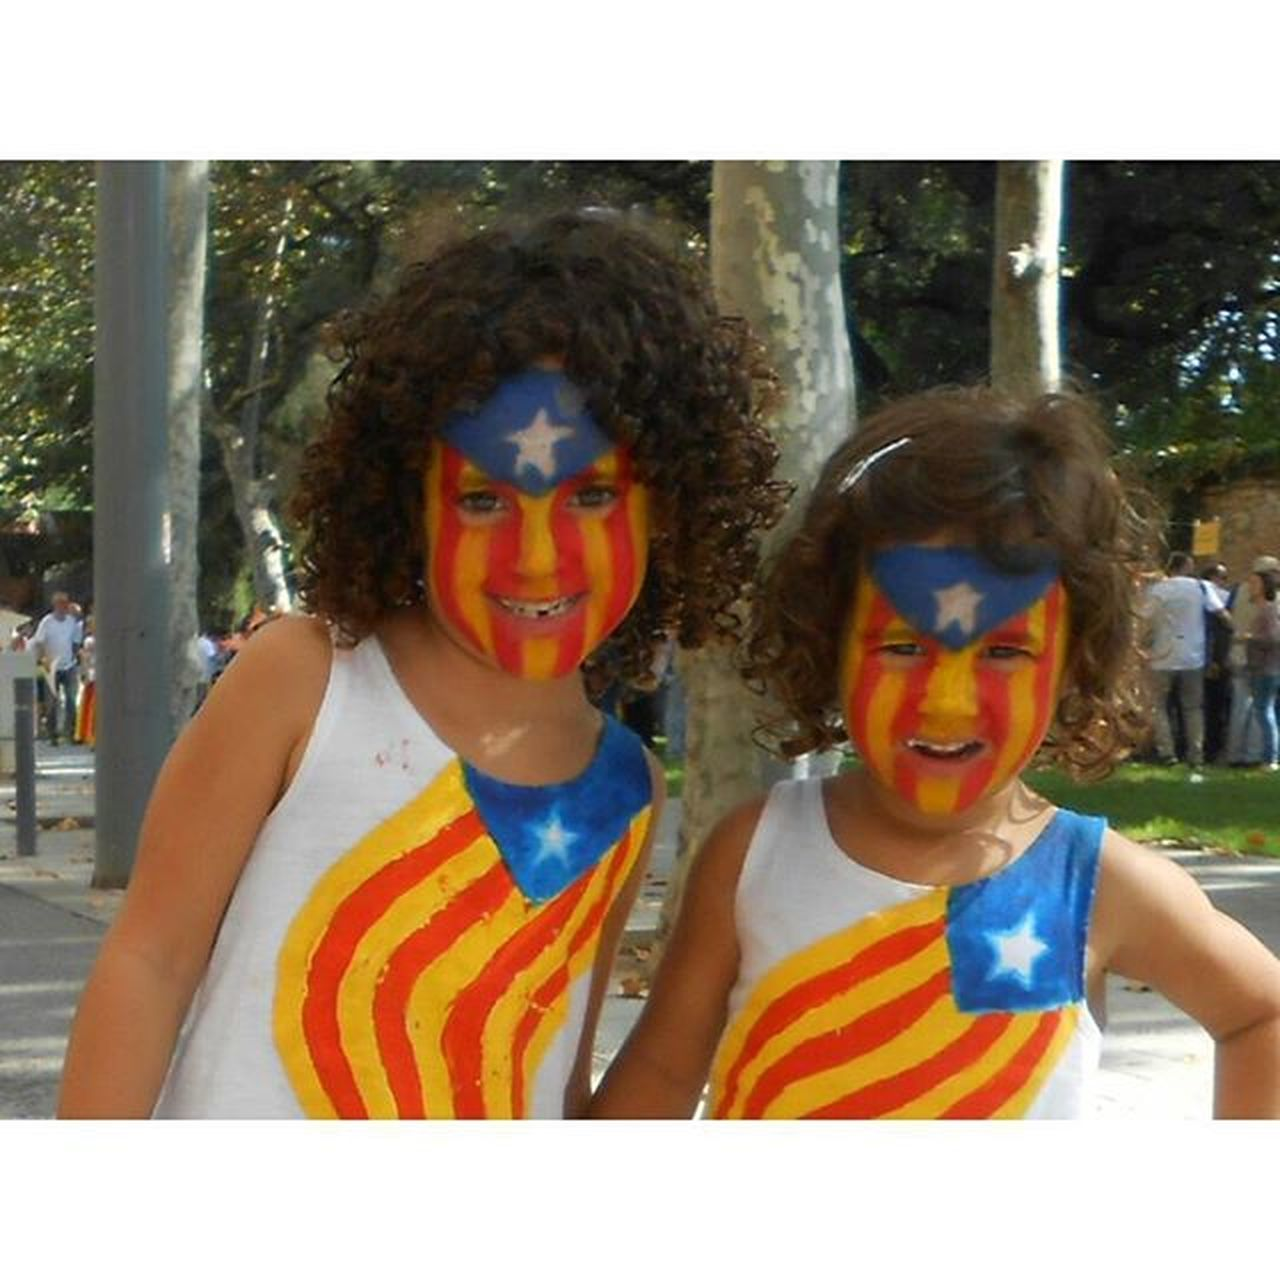 pictureTaken With The Accreditation ofinternational pressintheactof theDaySept. 11in Vialliureindependenceof Catalonia